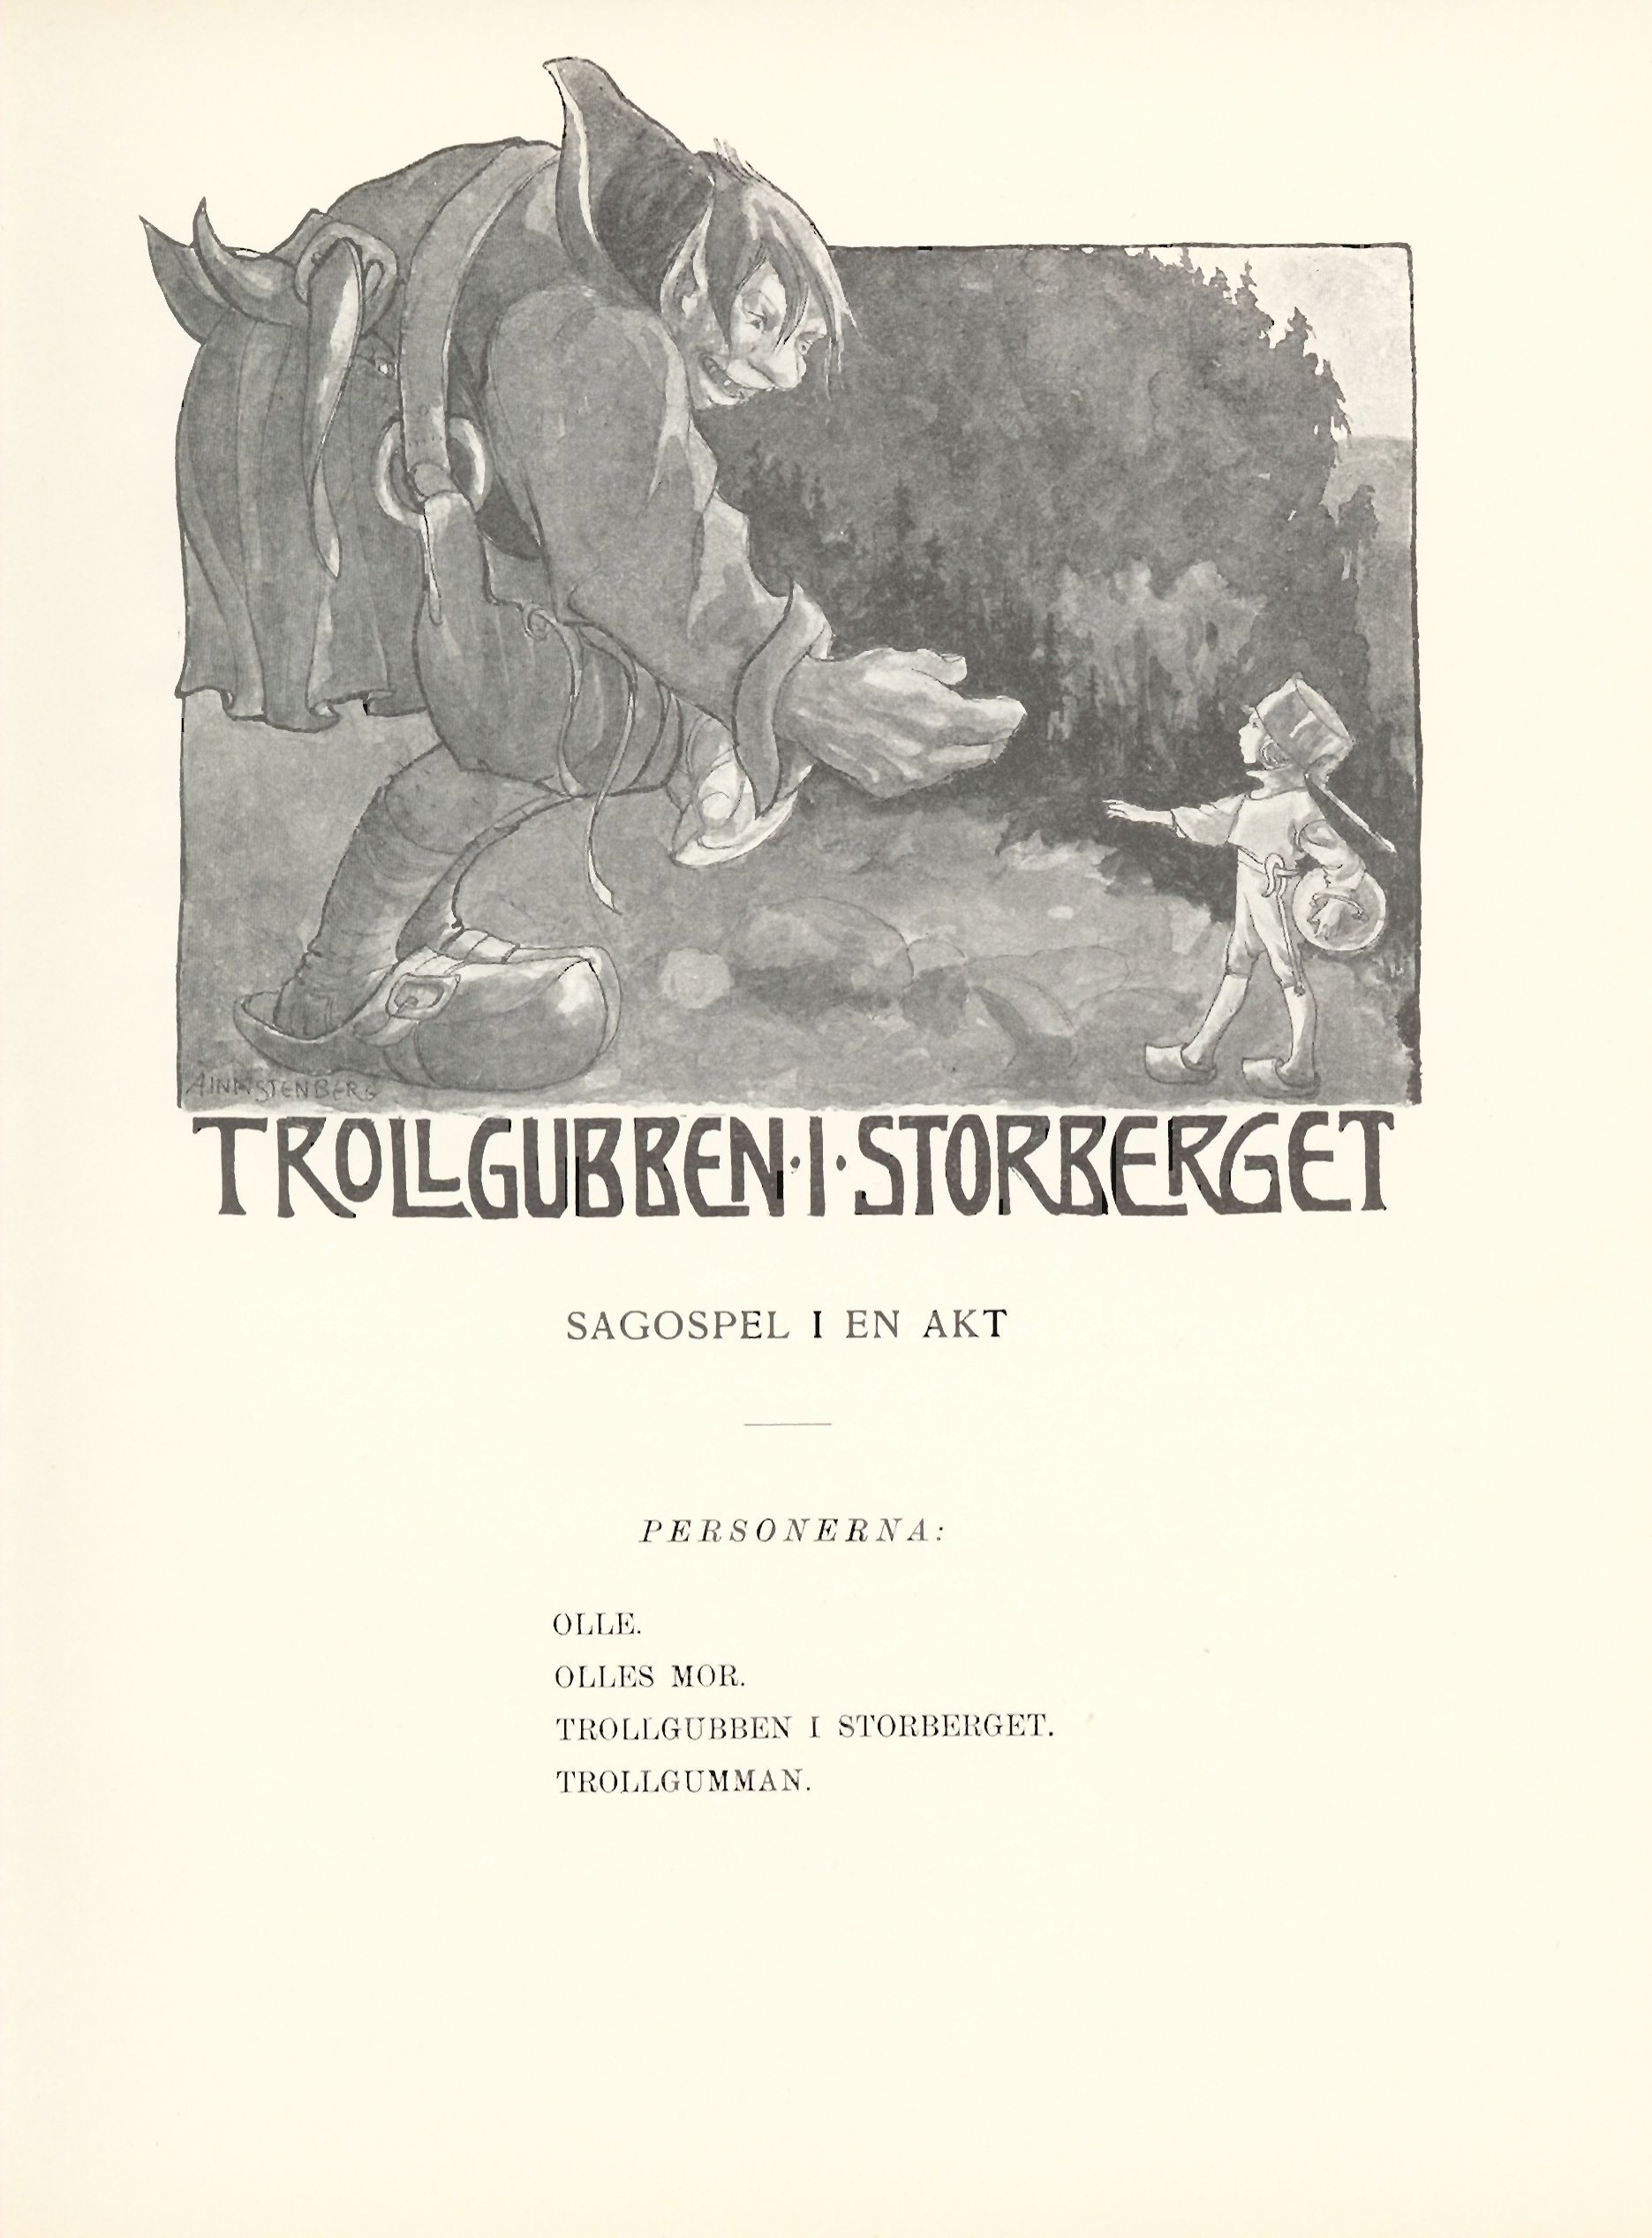 Aina Stenberg Masolle - Illustrazione per Trollgubben i storberget - sagospel i en akt - Anna Wahlenberg - 1911